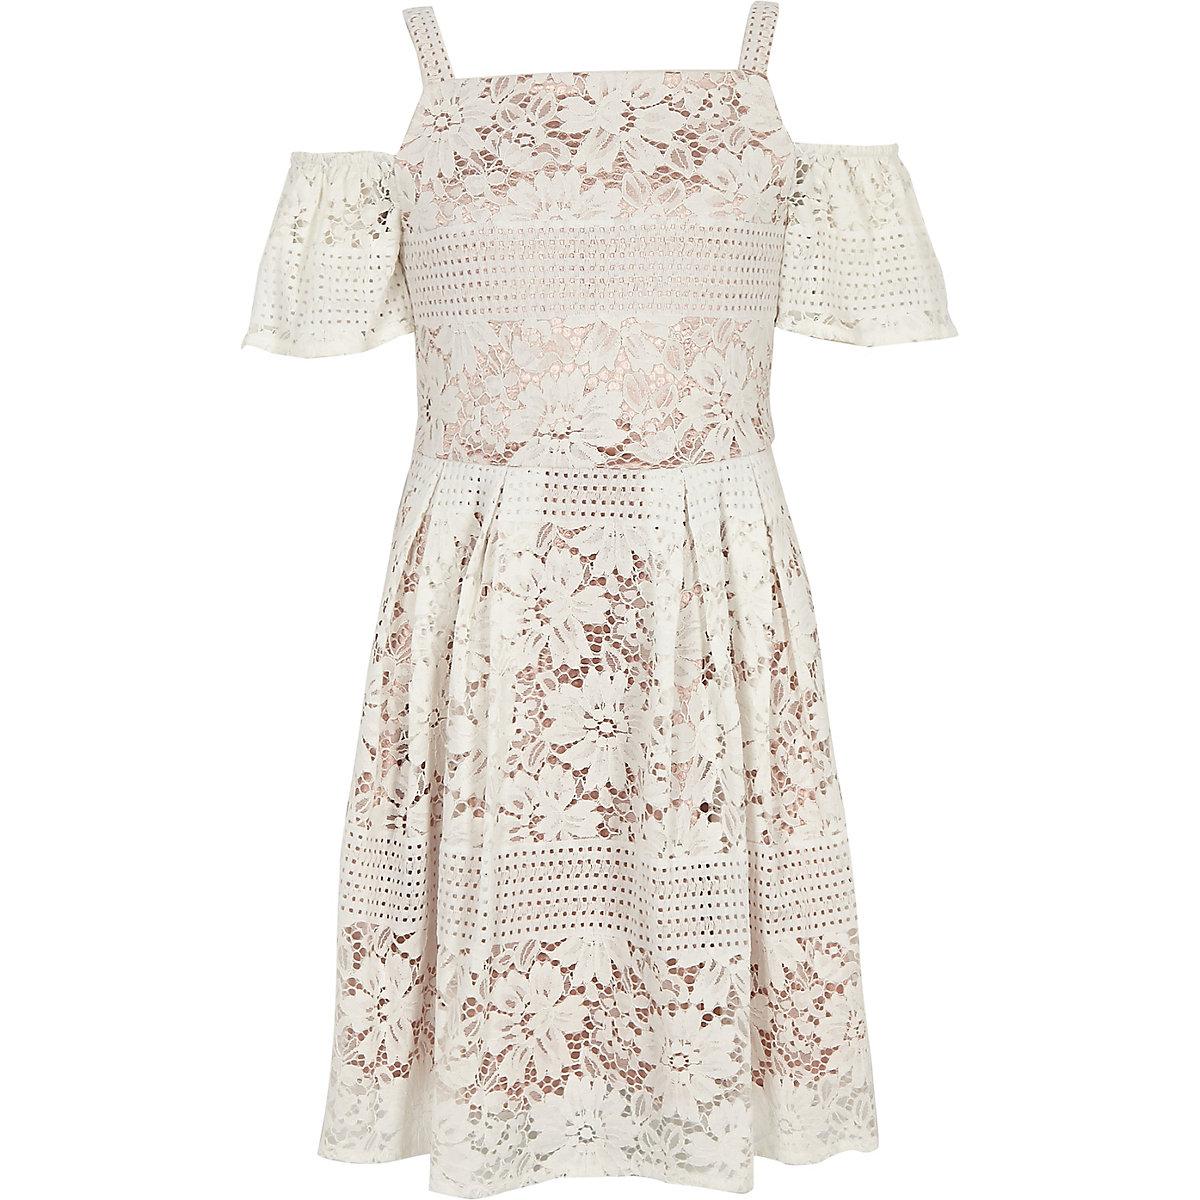 Girls cream lace cold shoulder dress